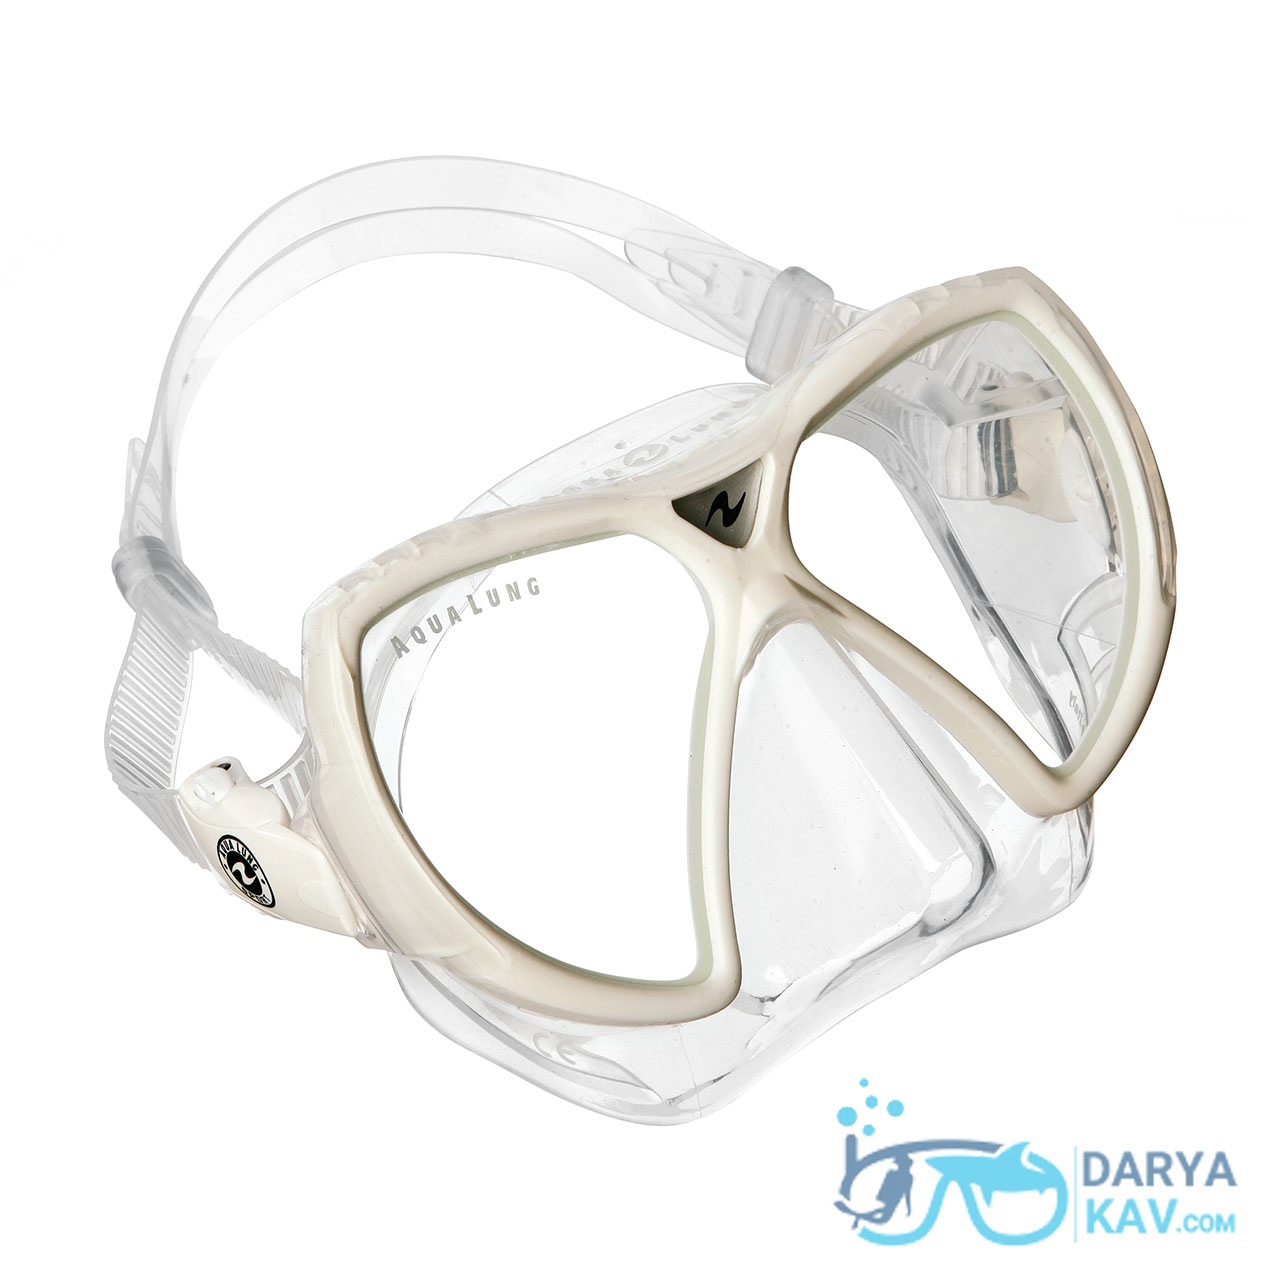 ماسک غواصی Visionflex LX